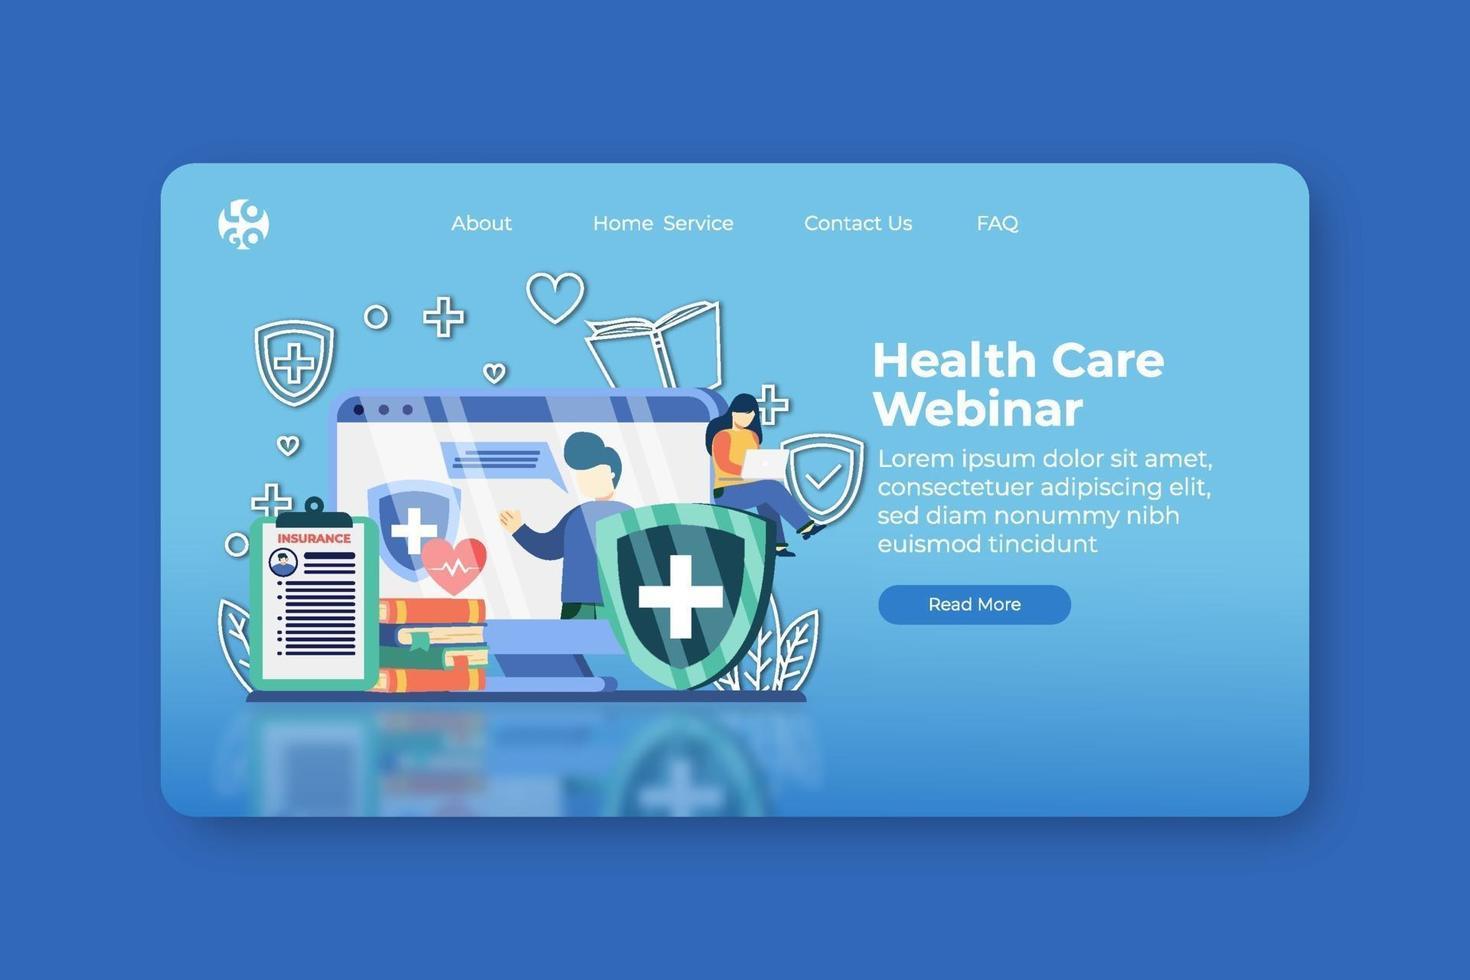 Modern flat design vector illustration. Health Care Webinar Landing Page and Web Banner Template. Training, Medical, Virus Education, Virus Protection Webinar, Virus Prevention Training.